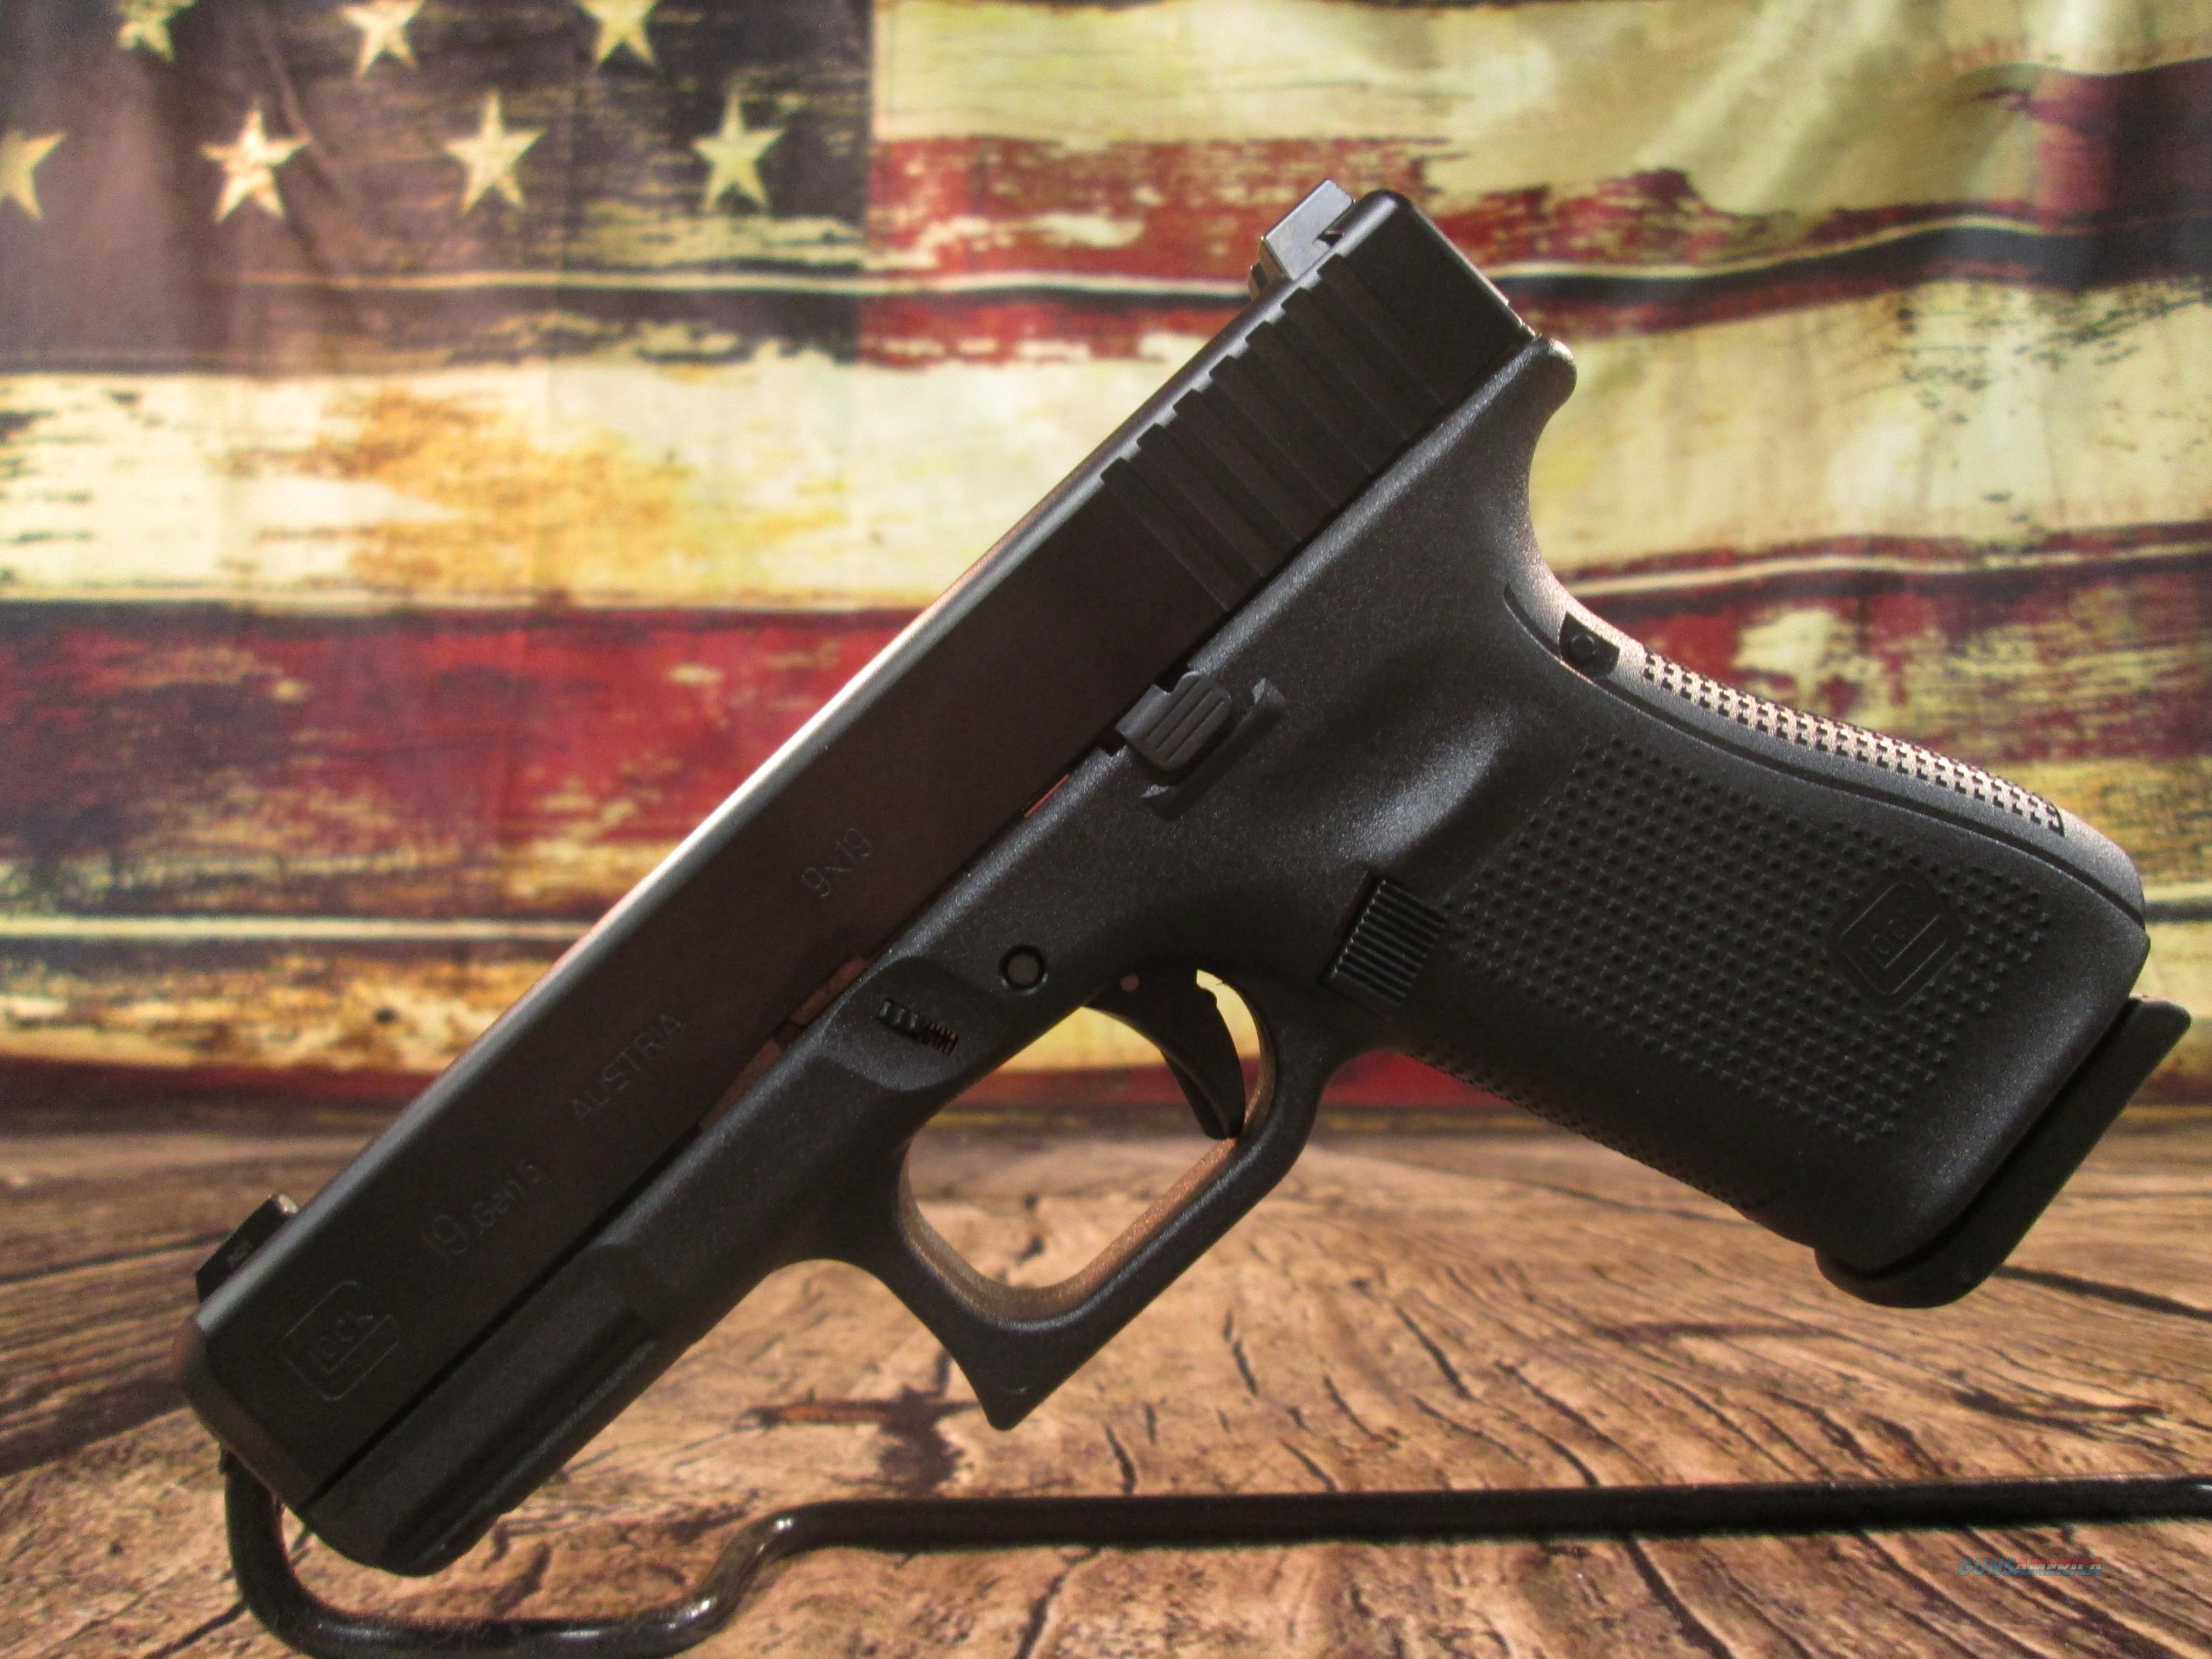 GLOCK MODEL 17 GEN 5 W/NIGHT SIGHTS NEW (PA1750703)  Guns > Pistols > Glock Pistols > 17